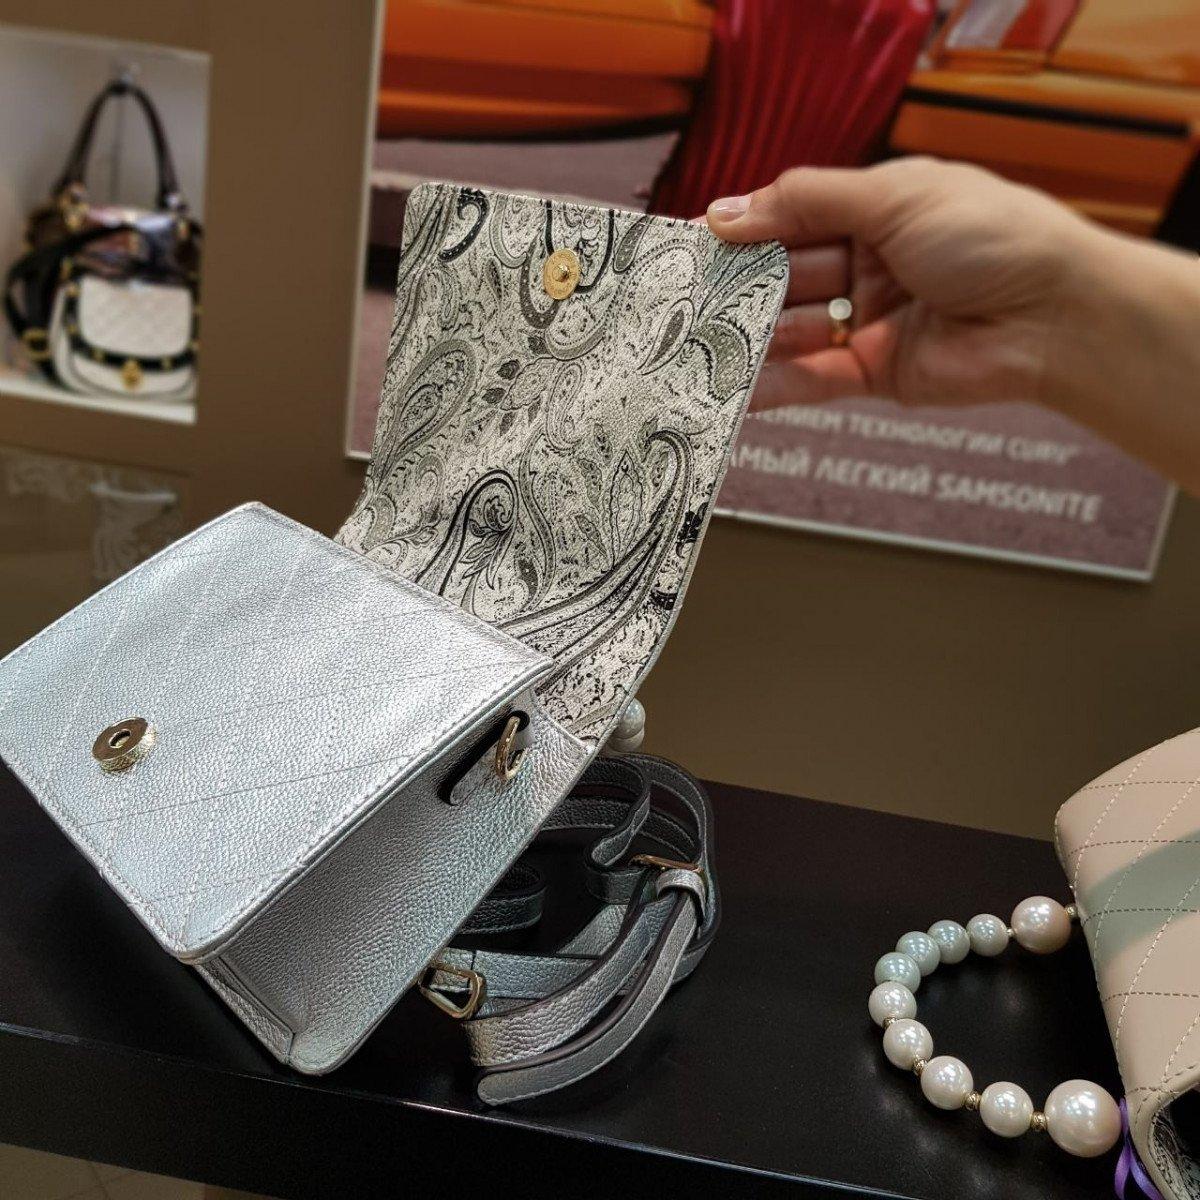 Женская кожаная сумка Alessandro Beato 4679 из натуральной кожи